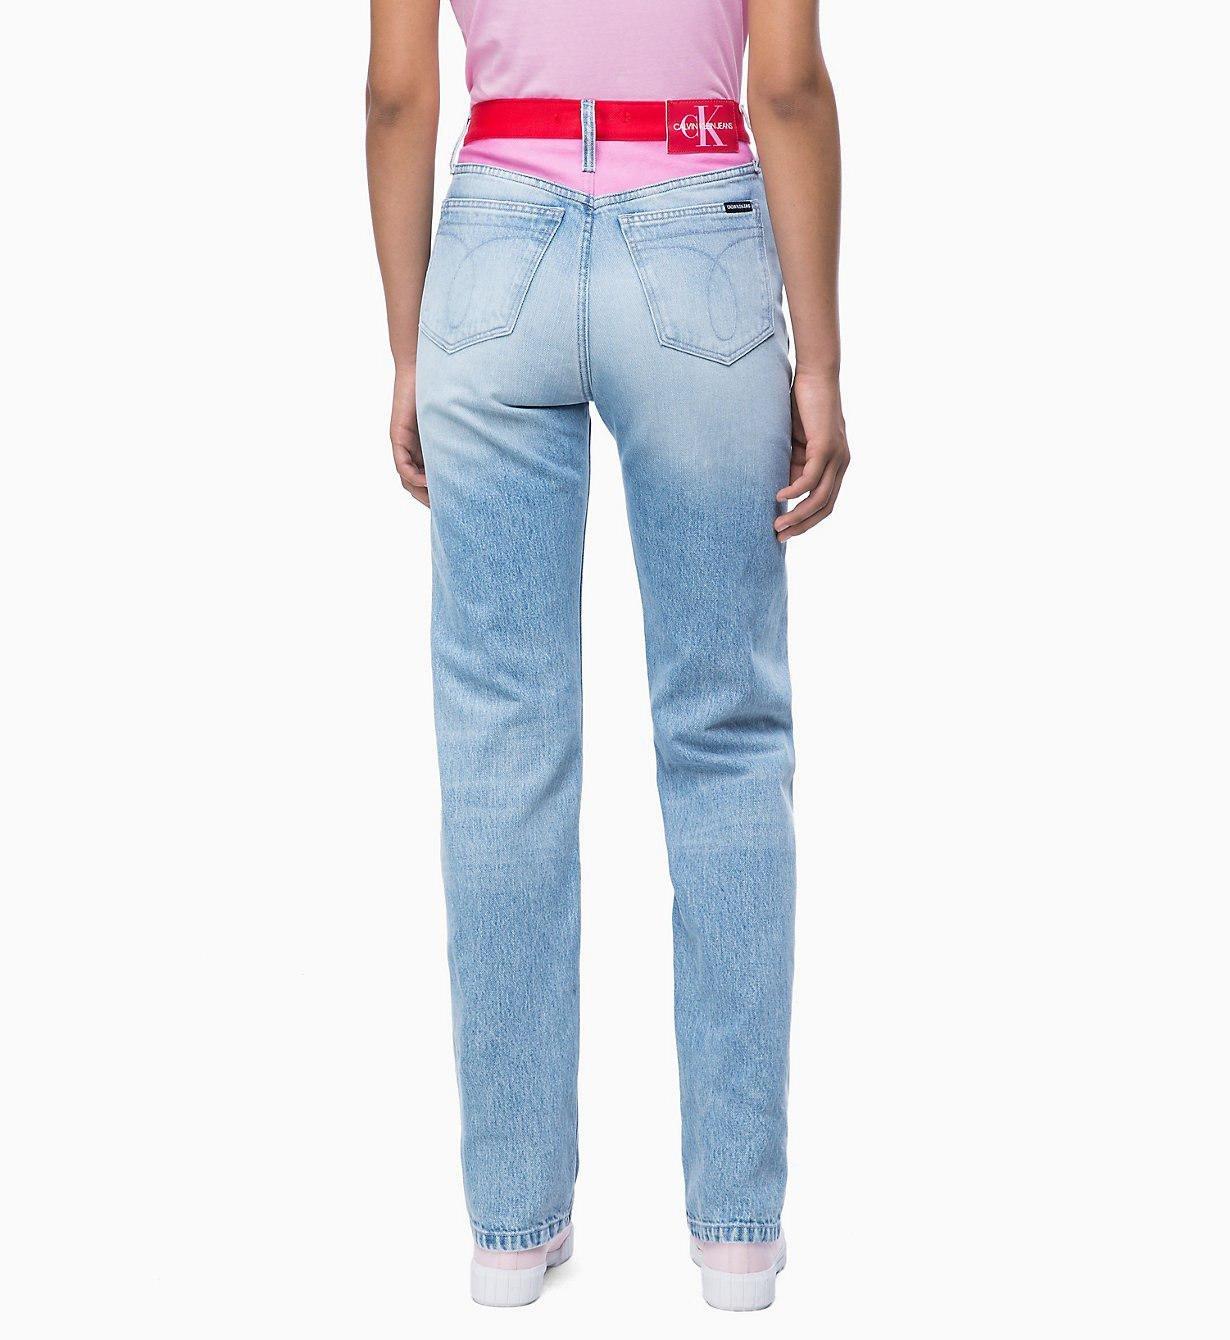 Calvin Klein - Blue Ckj 030 High Rise Straight Blocked Jeans - Lyst. View  fullscreen 1c3bf7ab42